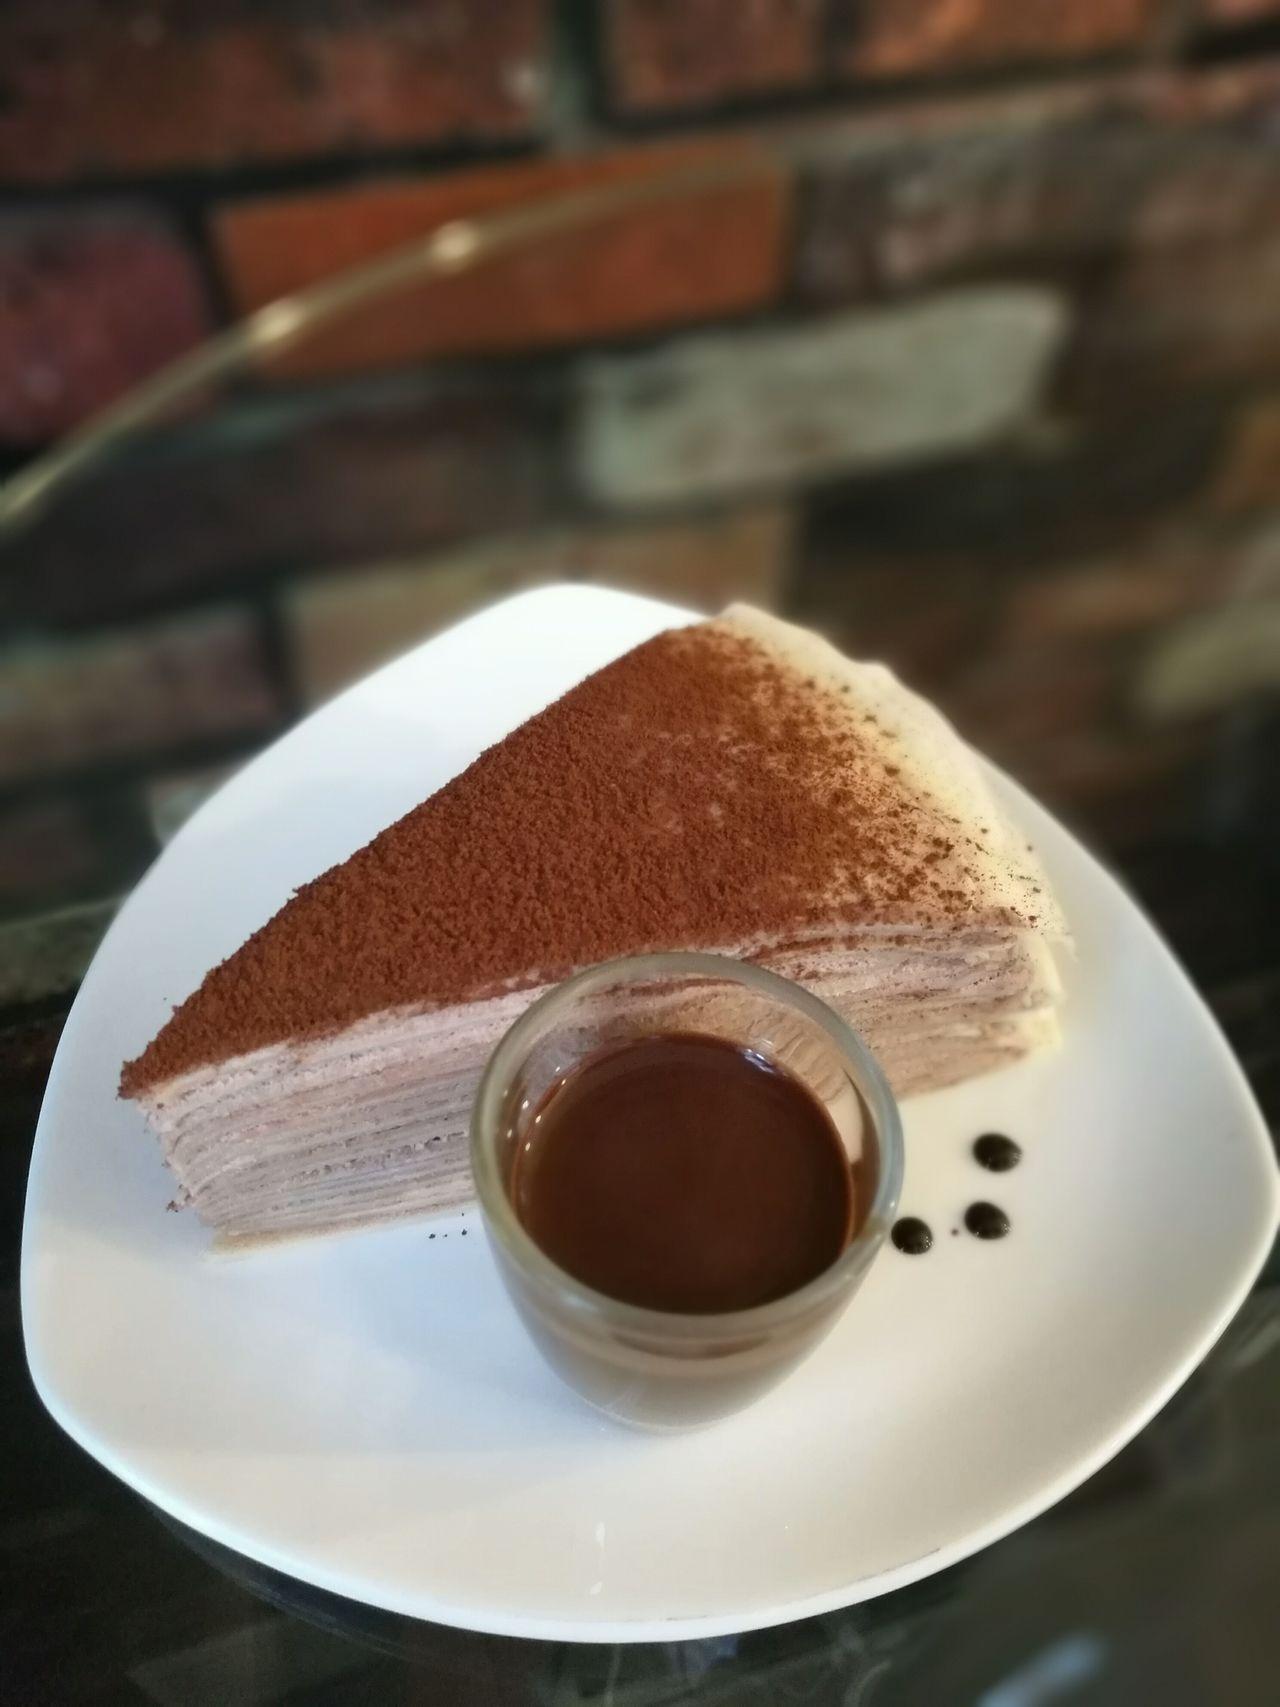 Crape Cake Chockolate Sauce Sweet Dessert Bakery